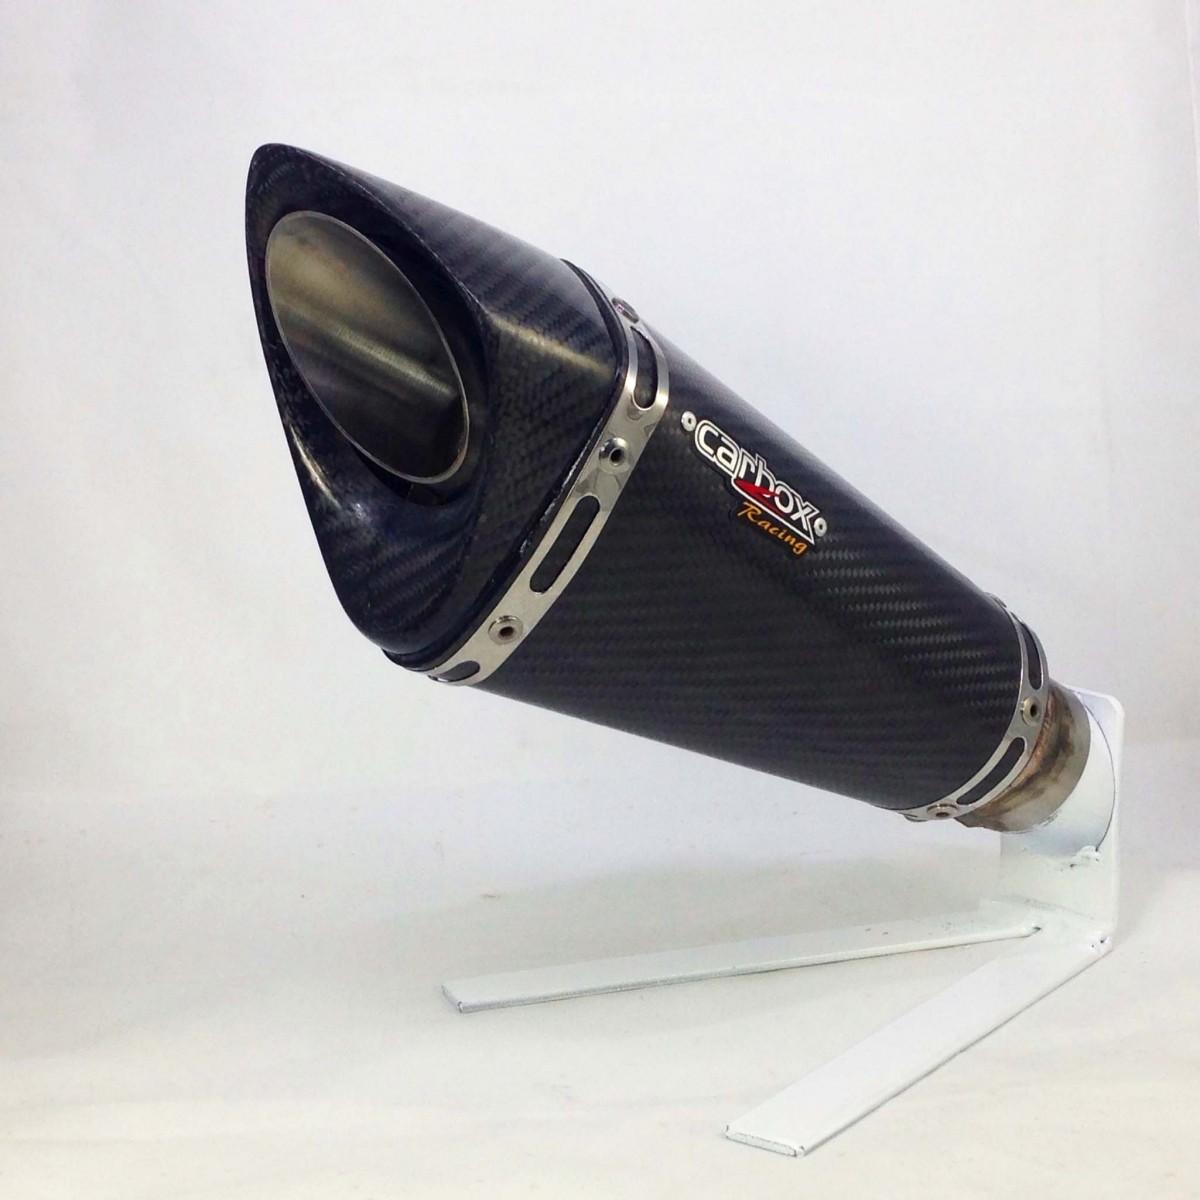 Escapamento Full 4x2x1 Scorpion Gp720 Carbon P/ Yamaha Xj6